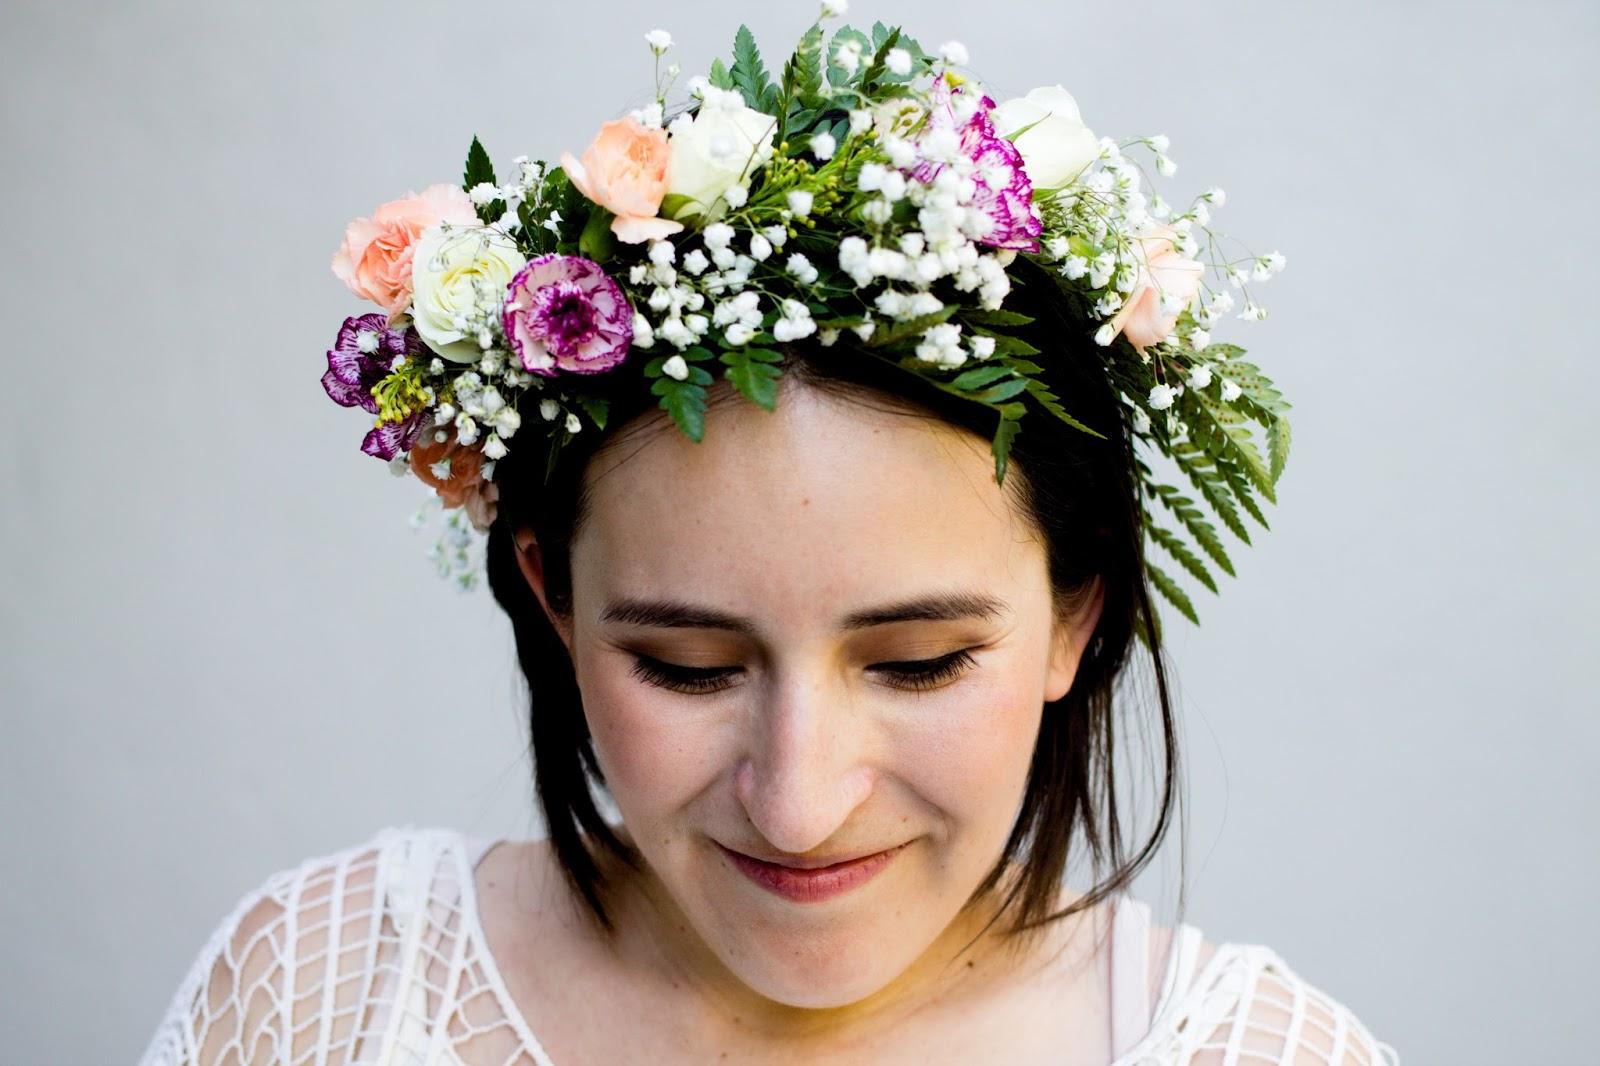 DIY Floral Workshop in Miami3